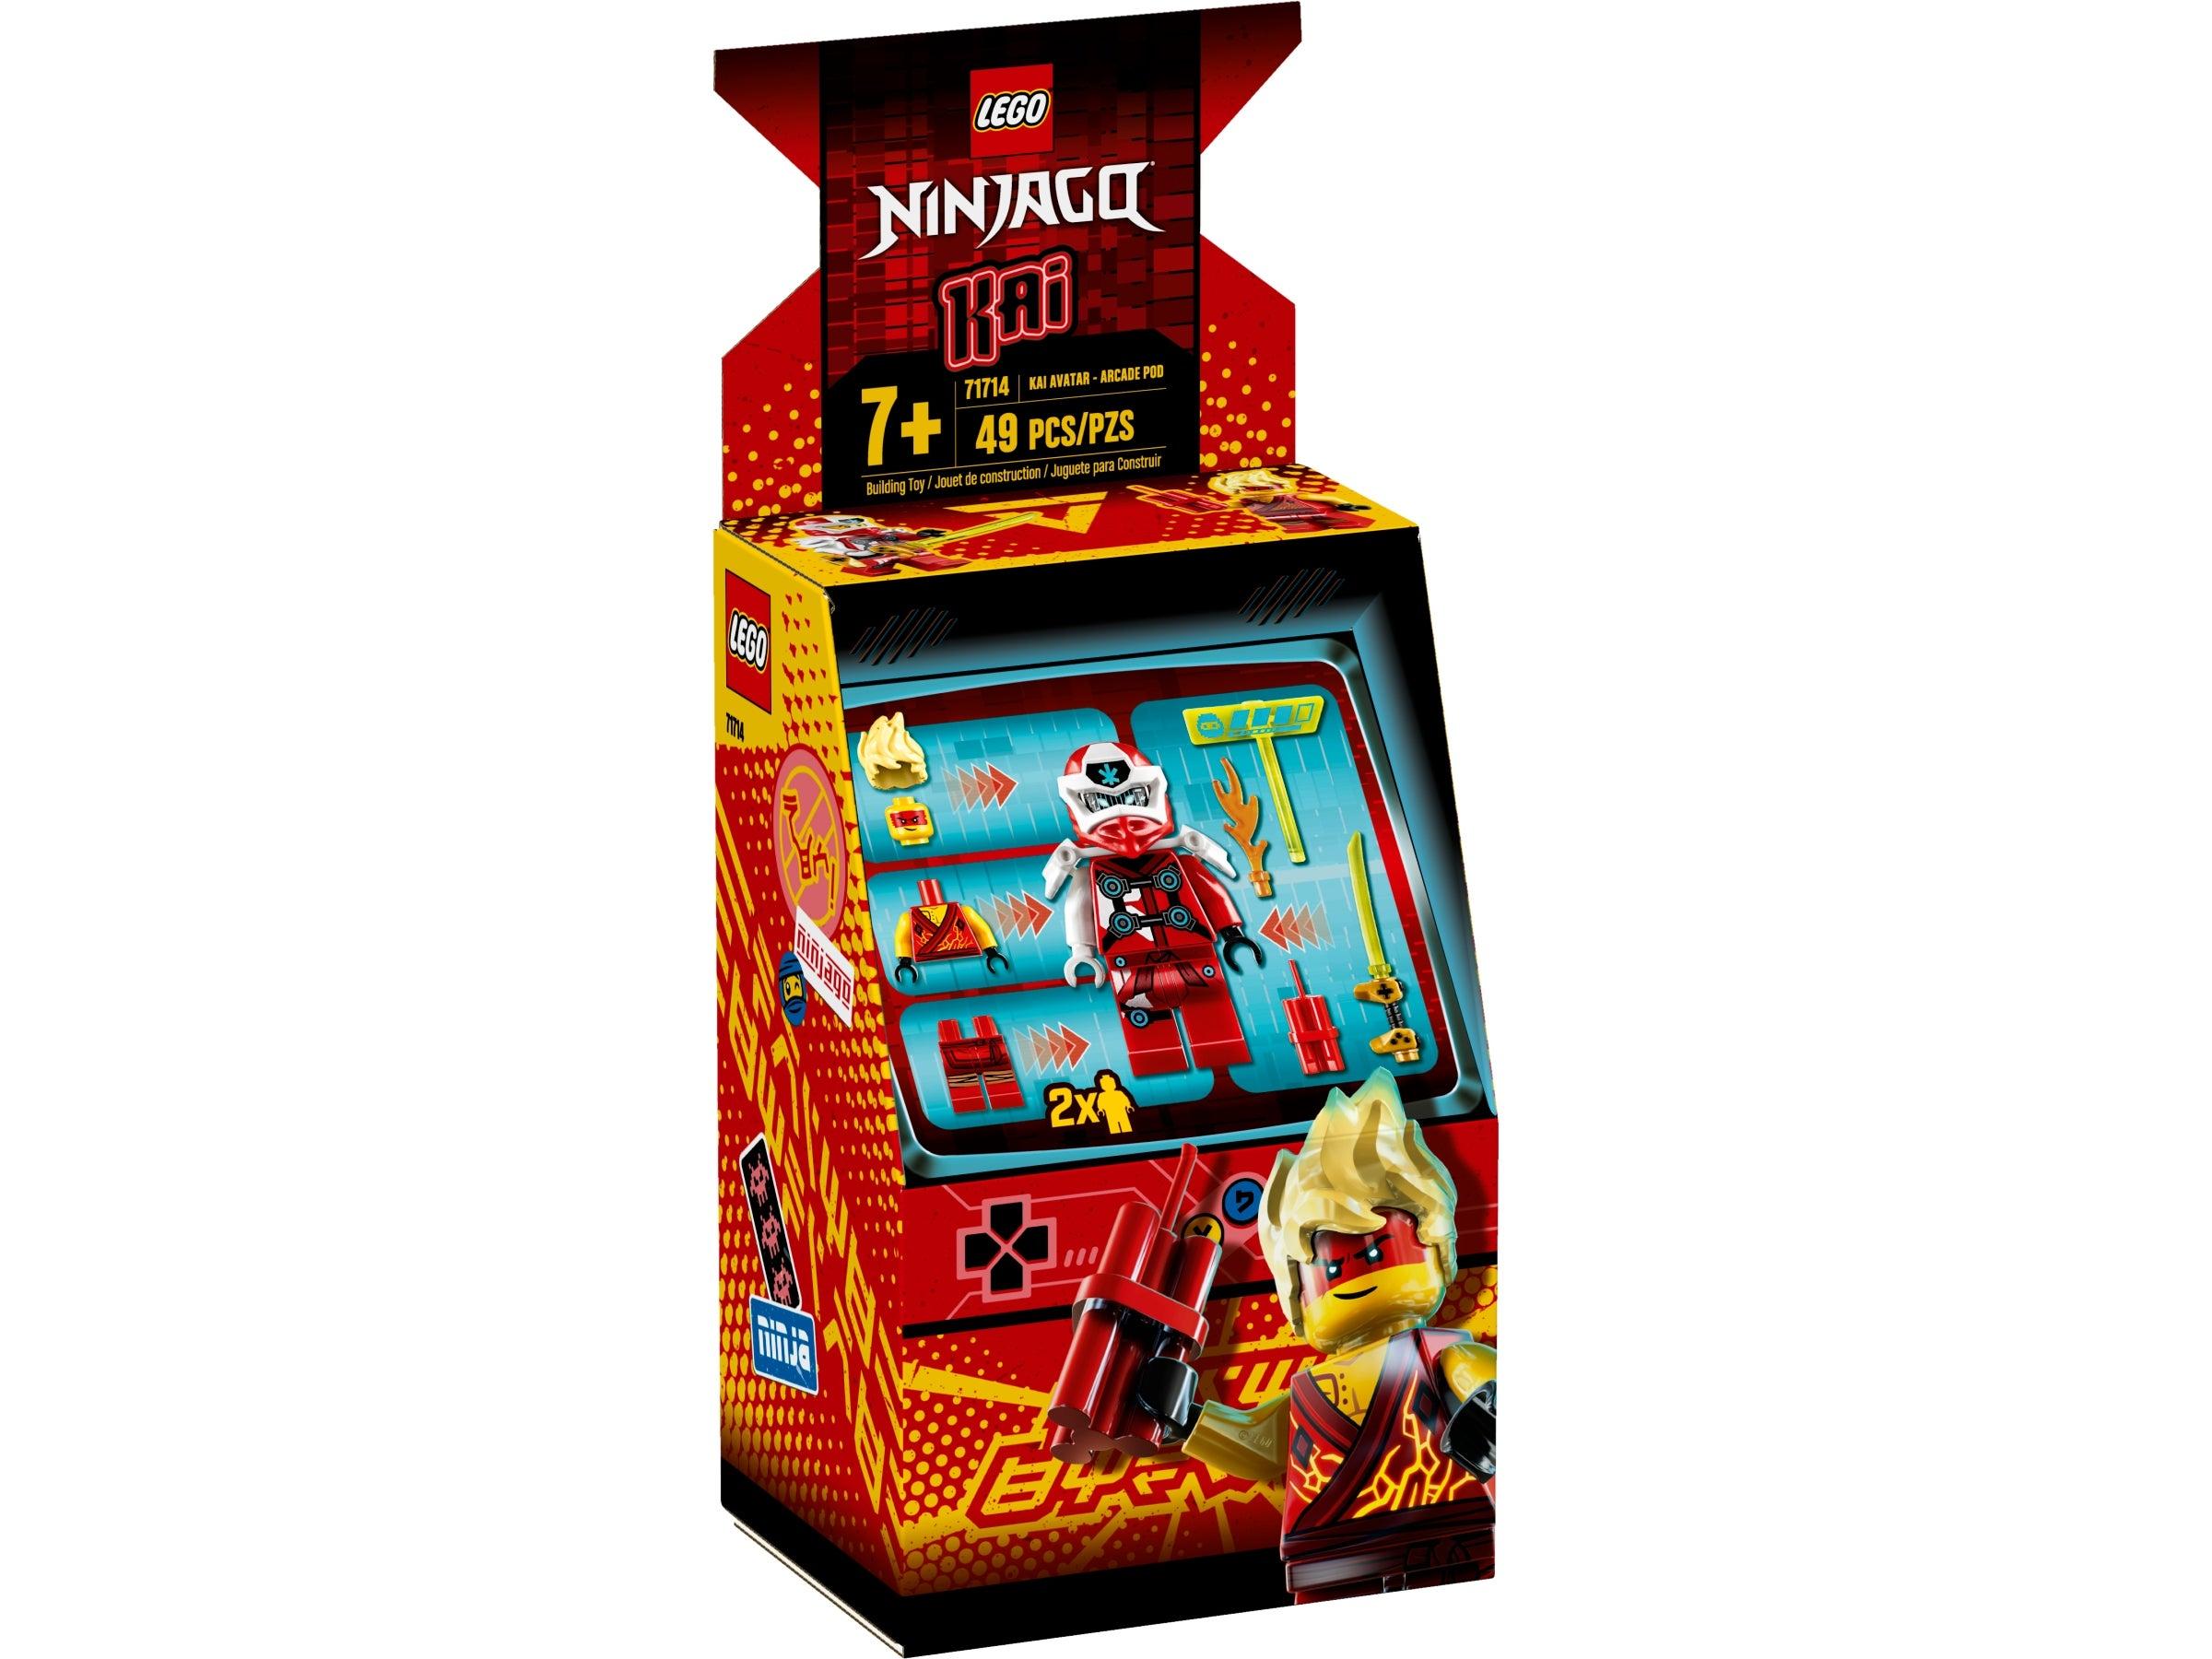 Lego Video Arcade Game Marvel 9 Pieces